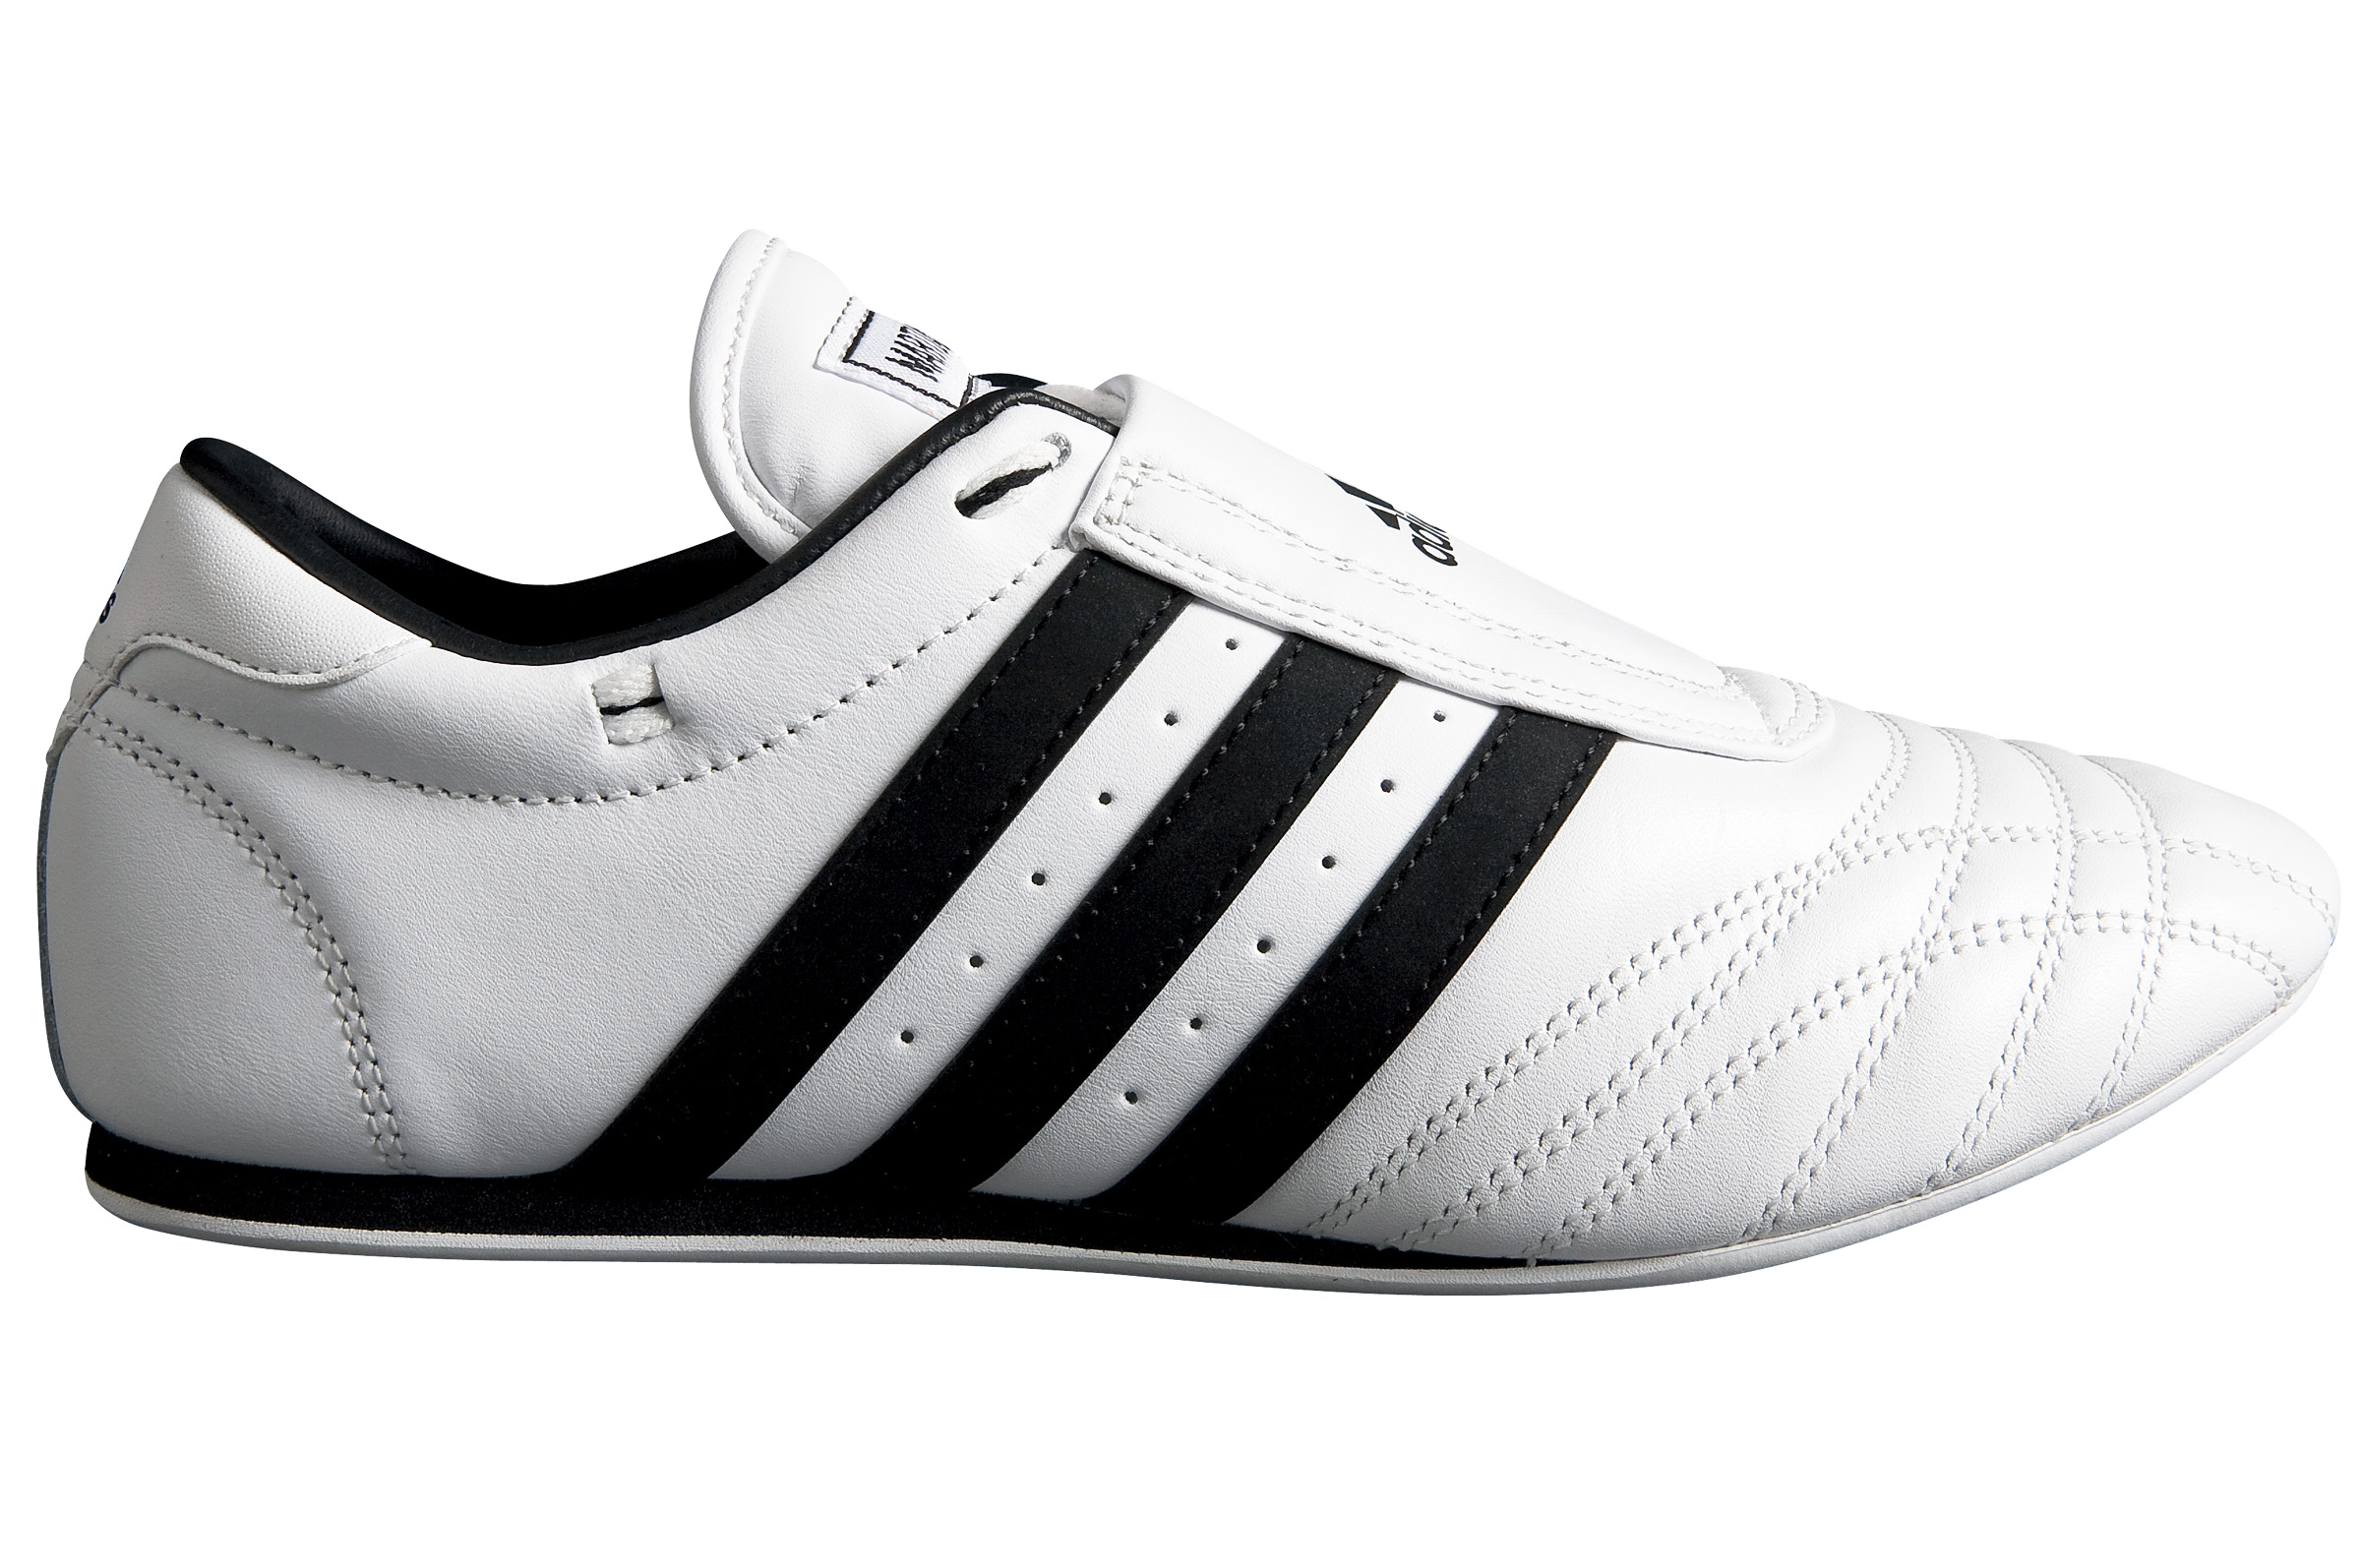 Adidas Chaussures Taekwondodoboks De amp; Taekwondo YFagqT